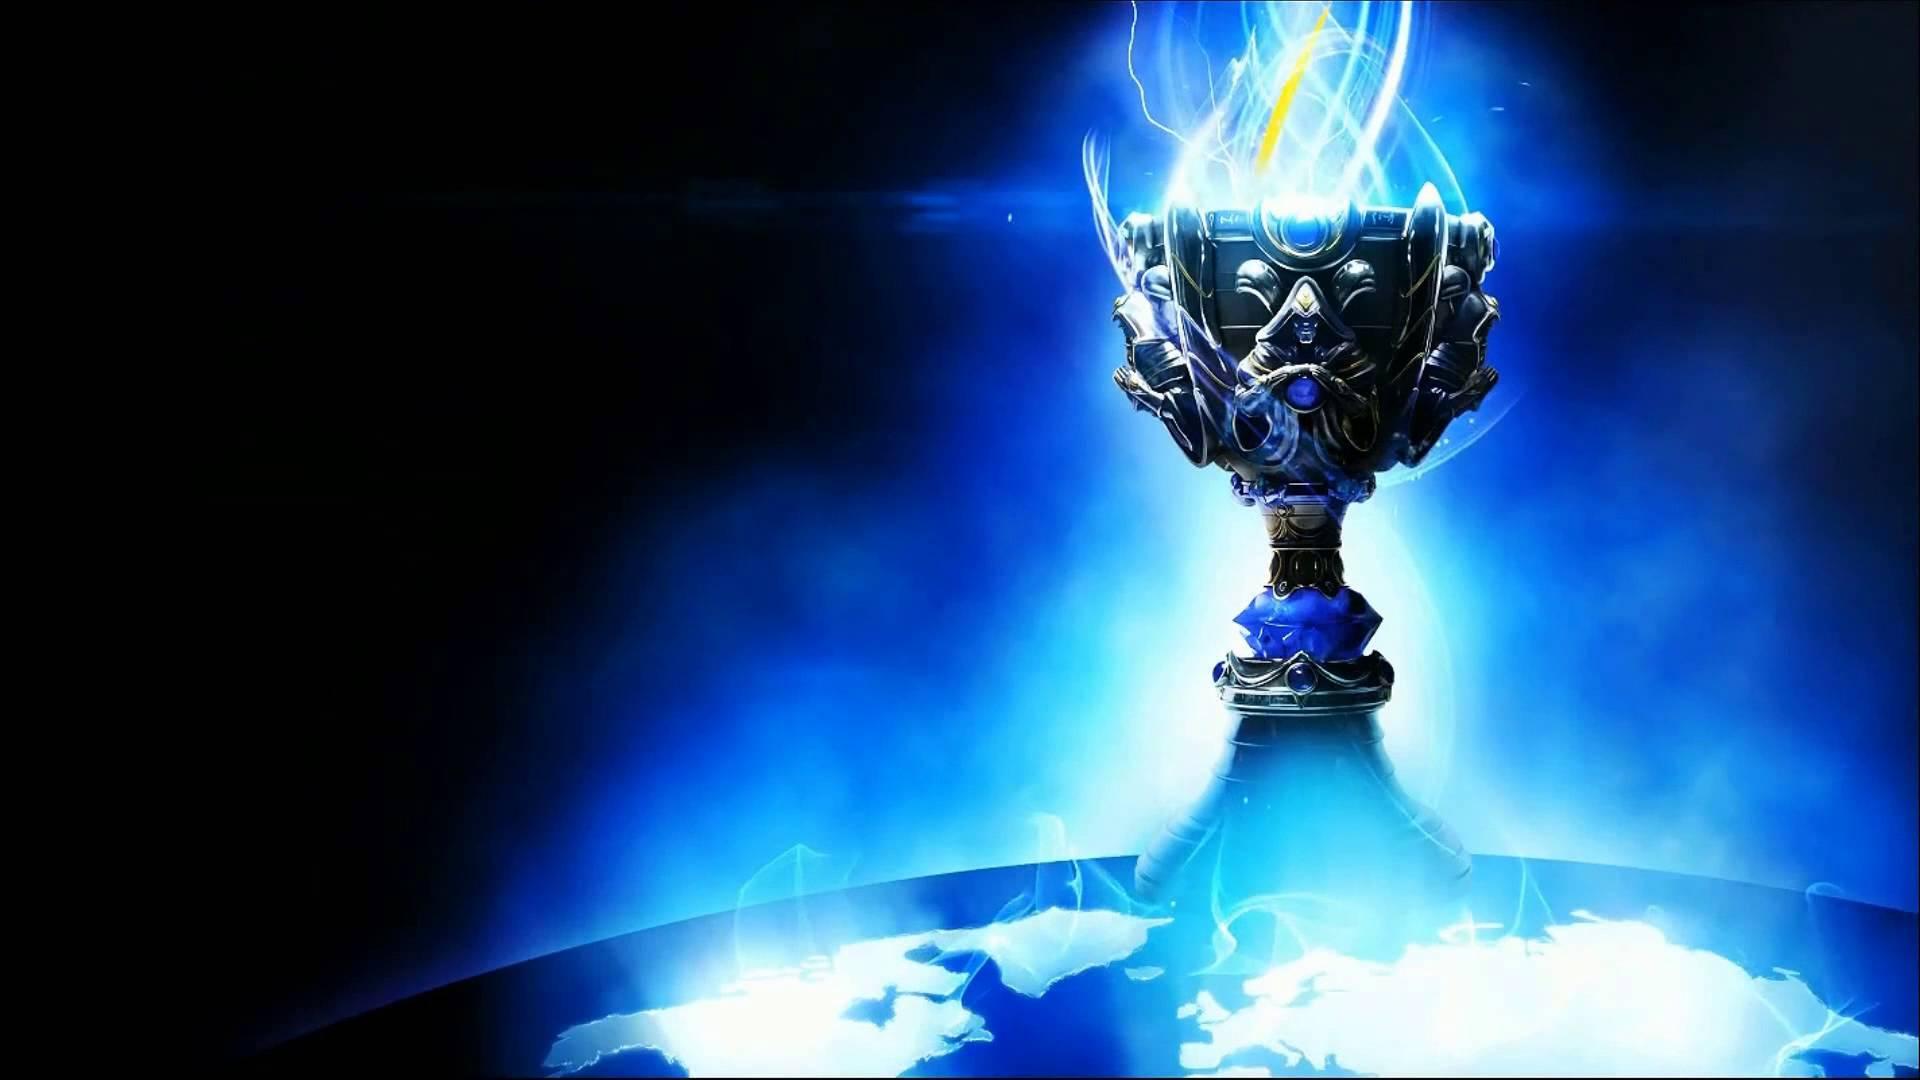 League Of Legends Season 3 World Championship wallpaper   1125062 1920x1080